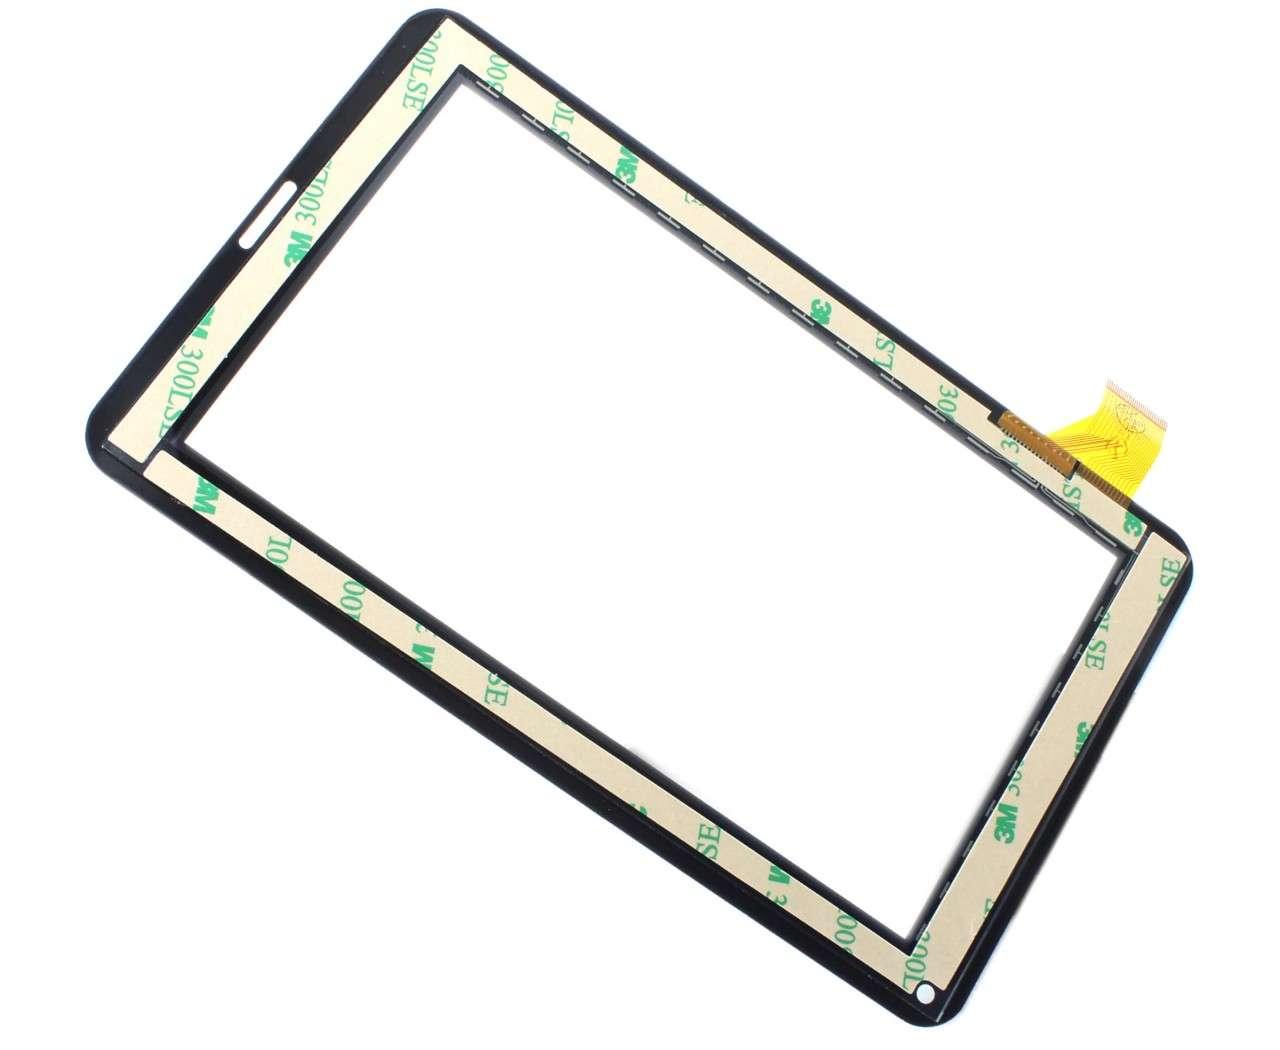 Touchscreen Digitizer Denver TAD 70132 Geam Sticla Tableta imagine powerlaptop.ro 2021